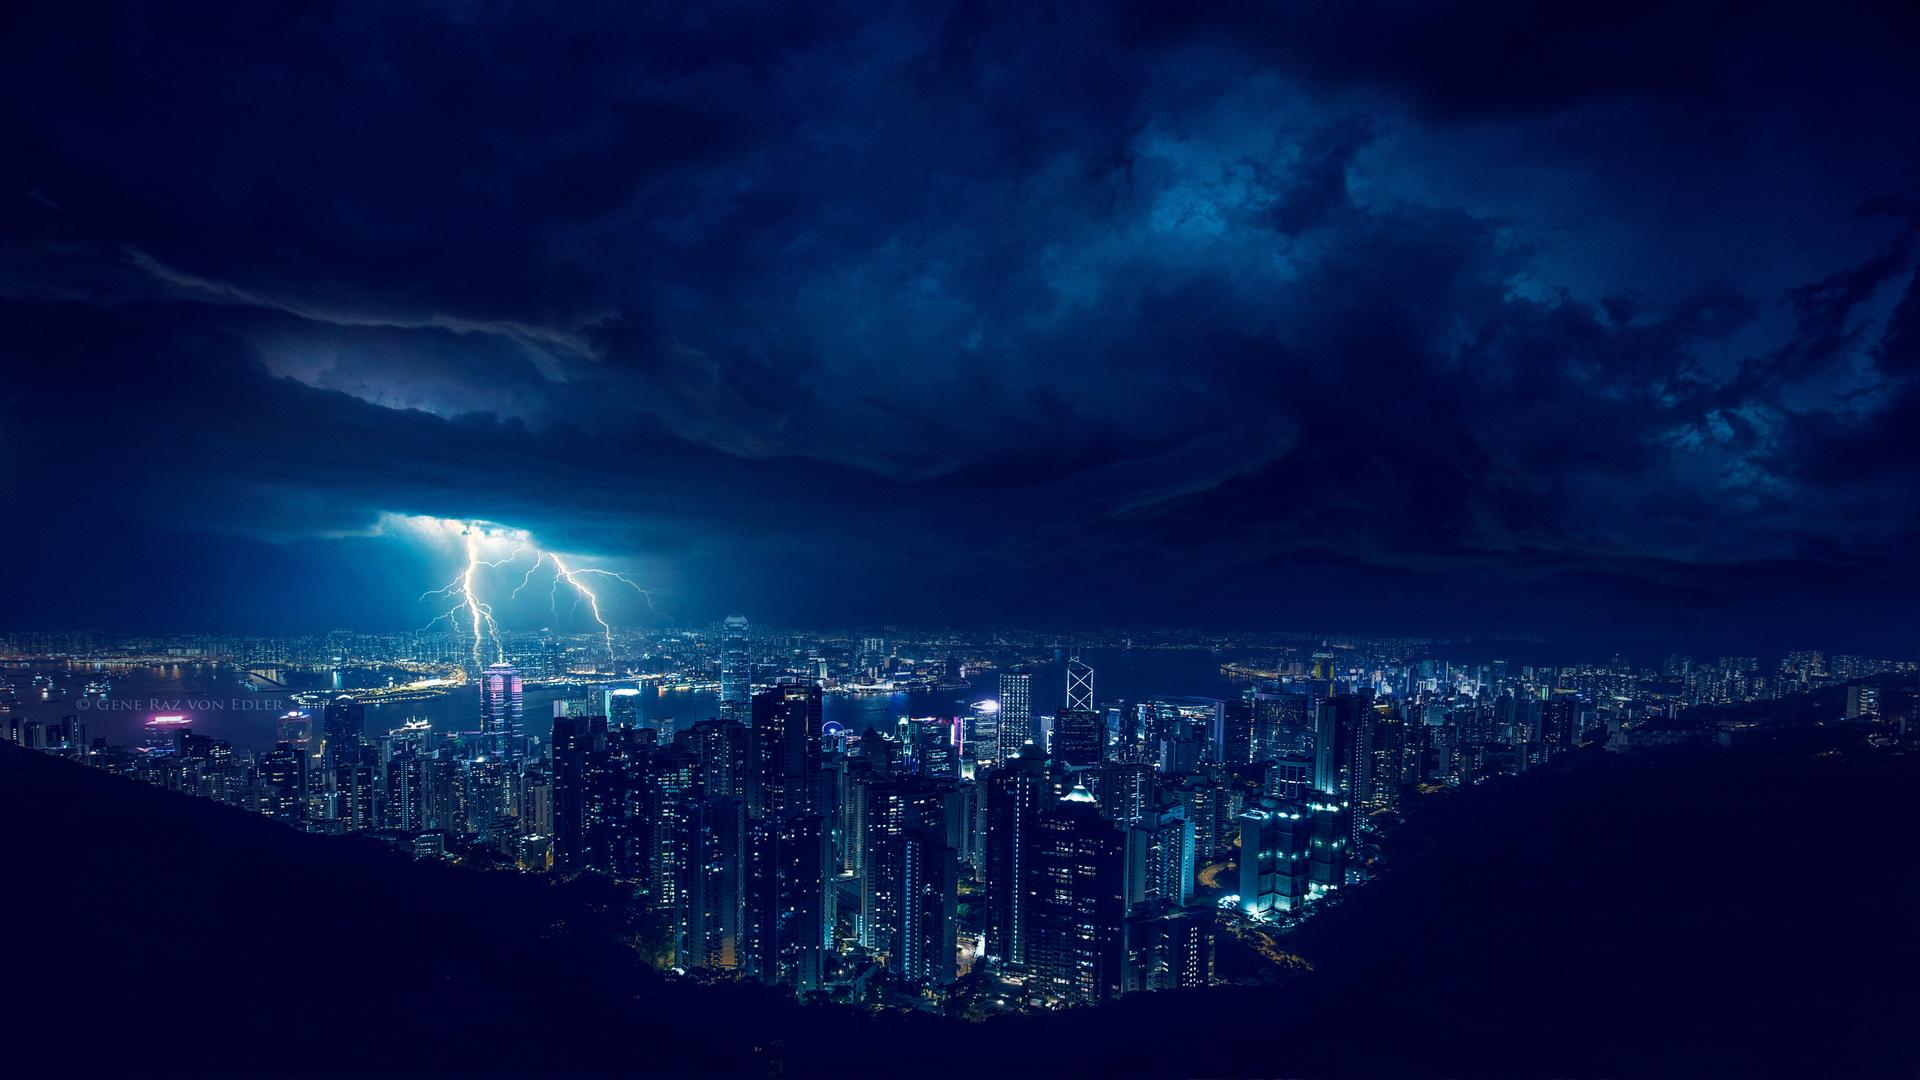 1920x1080 storm night lightning in city 4k laptop full hd 1080p hd 4k wallpapers images - Lightning wallpaper 4k ...